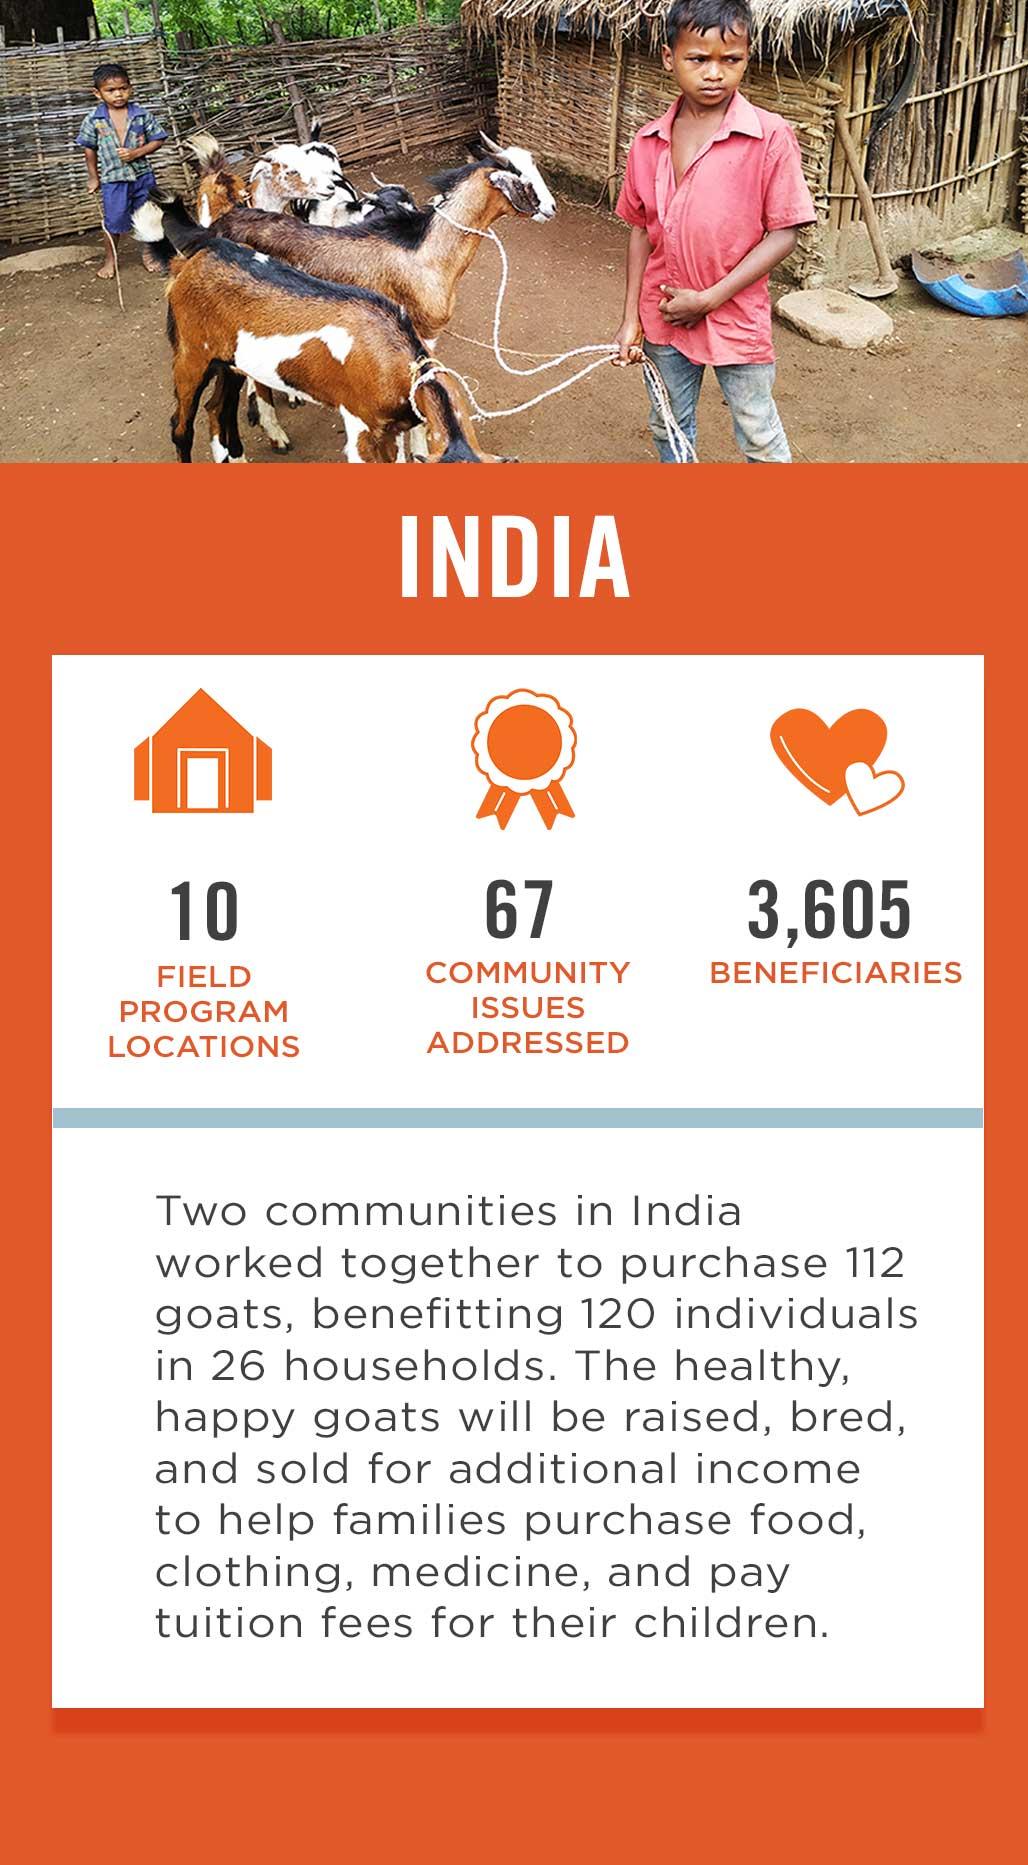 India Field Program